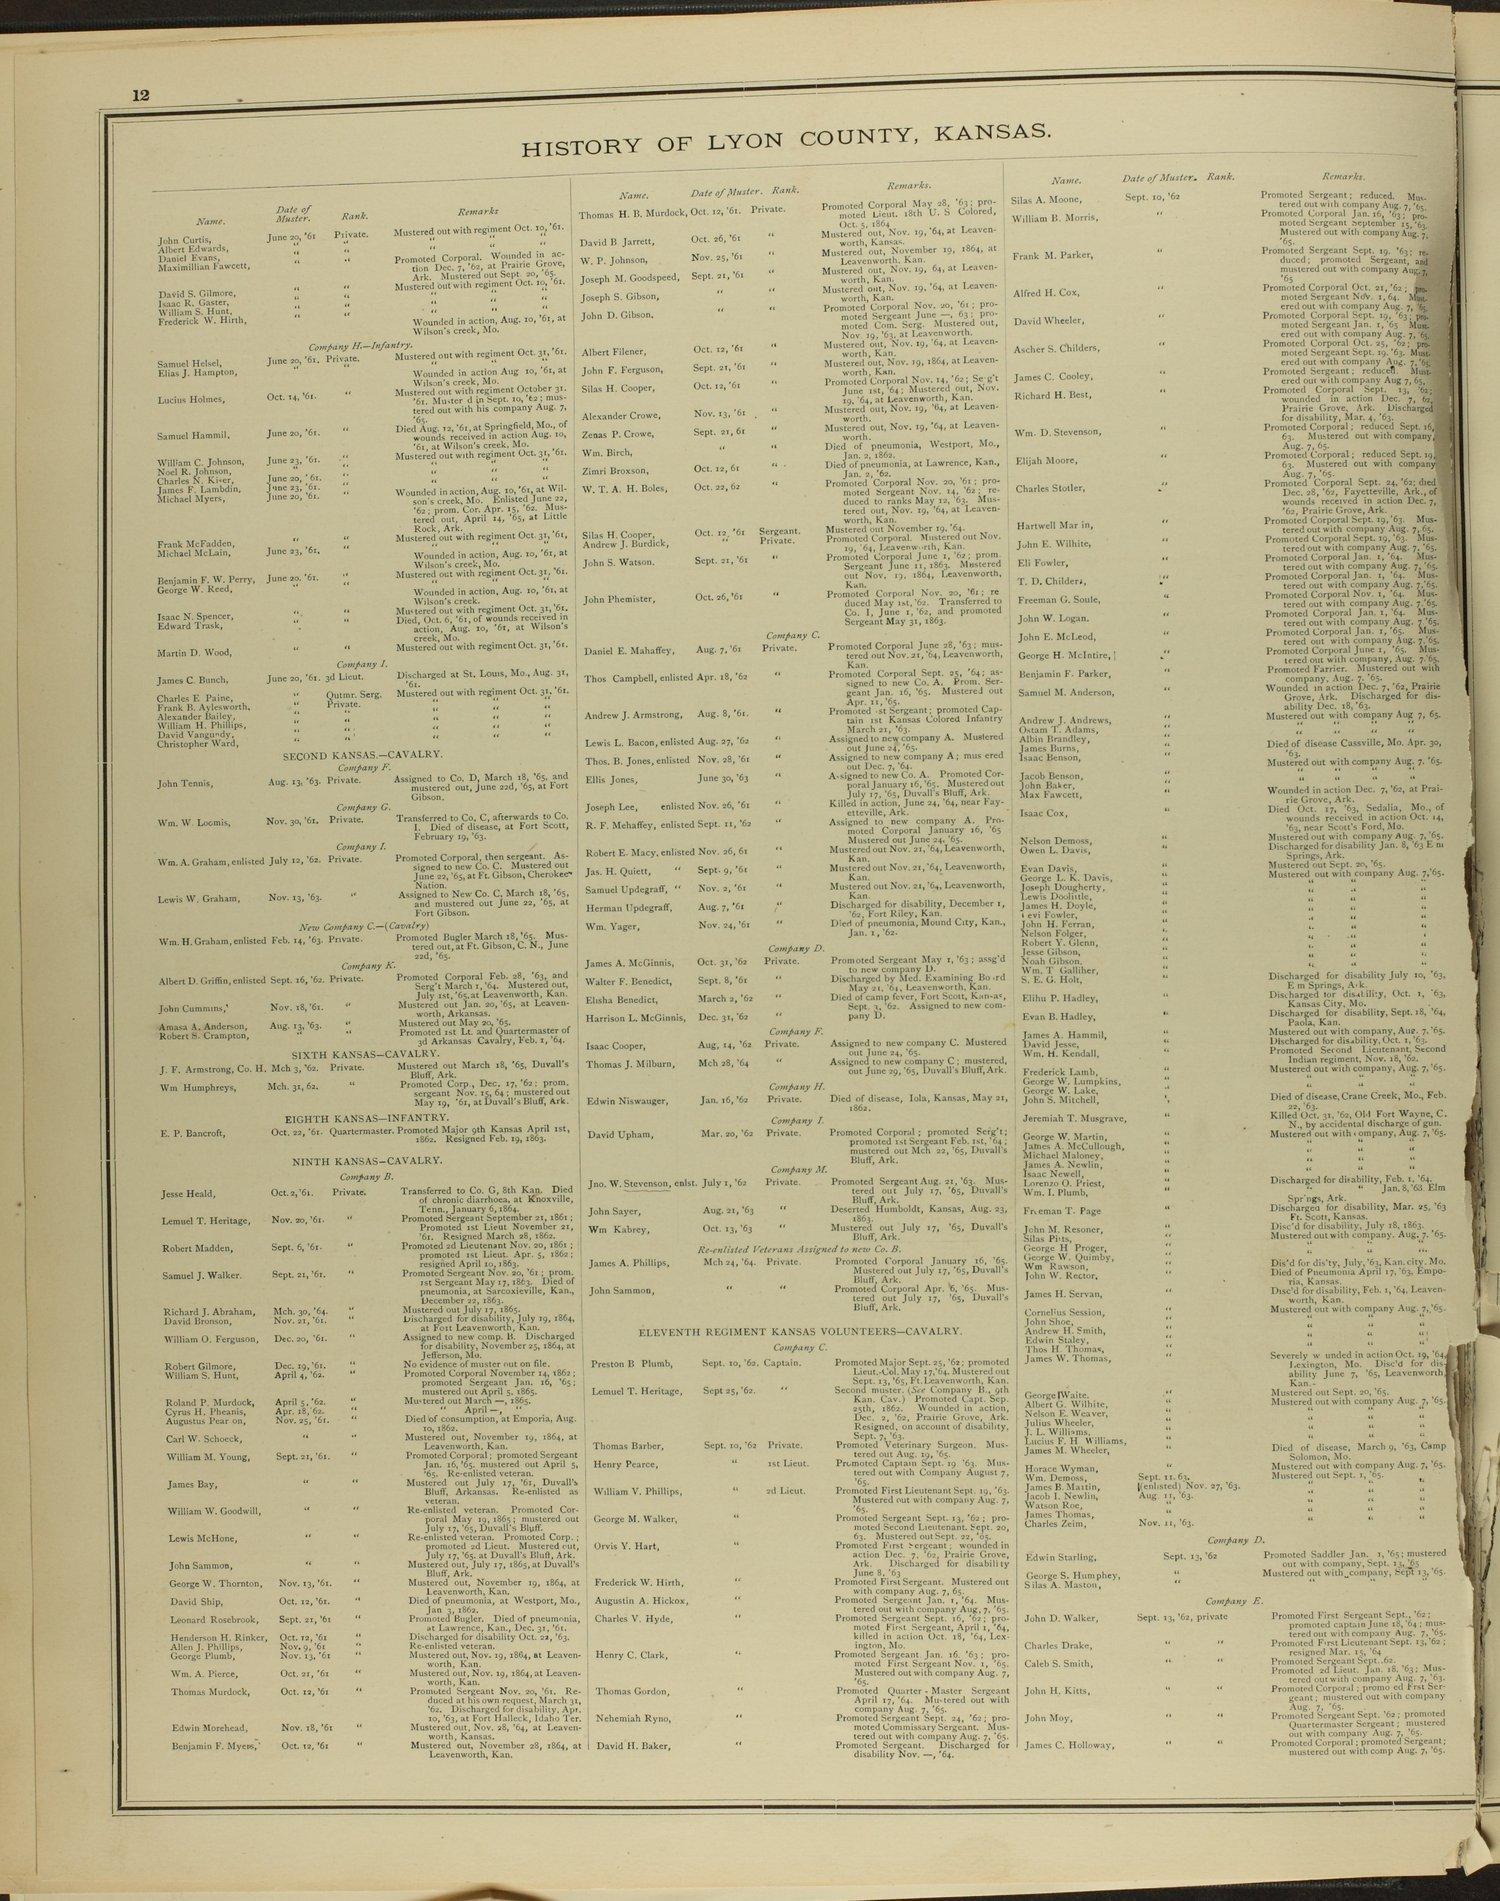 An illustrated historical atlas of Lyon county, Kansas - 12